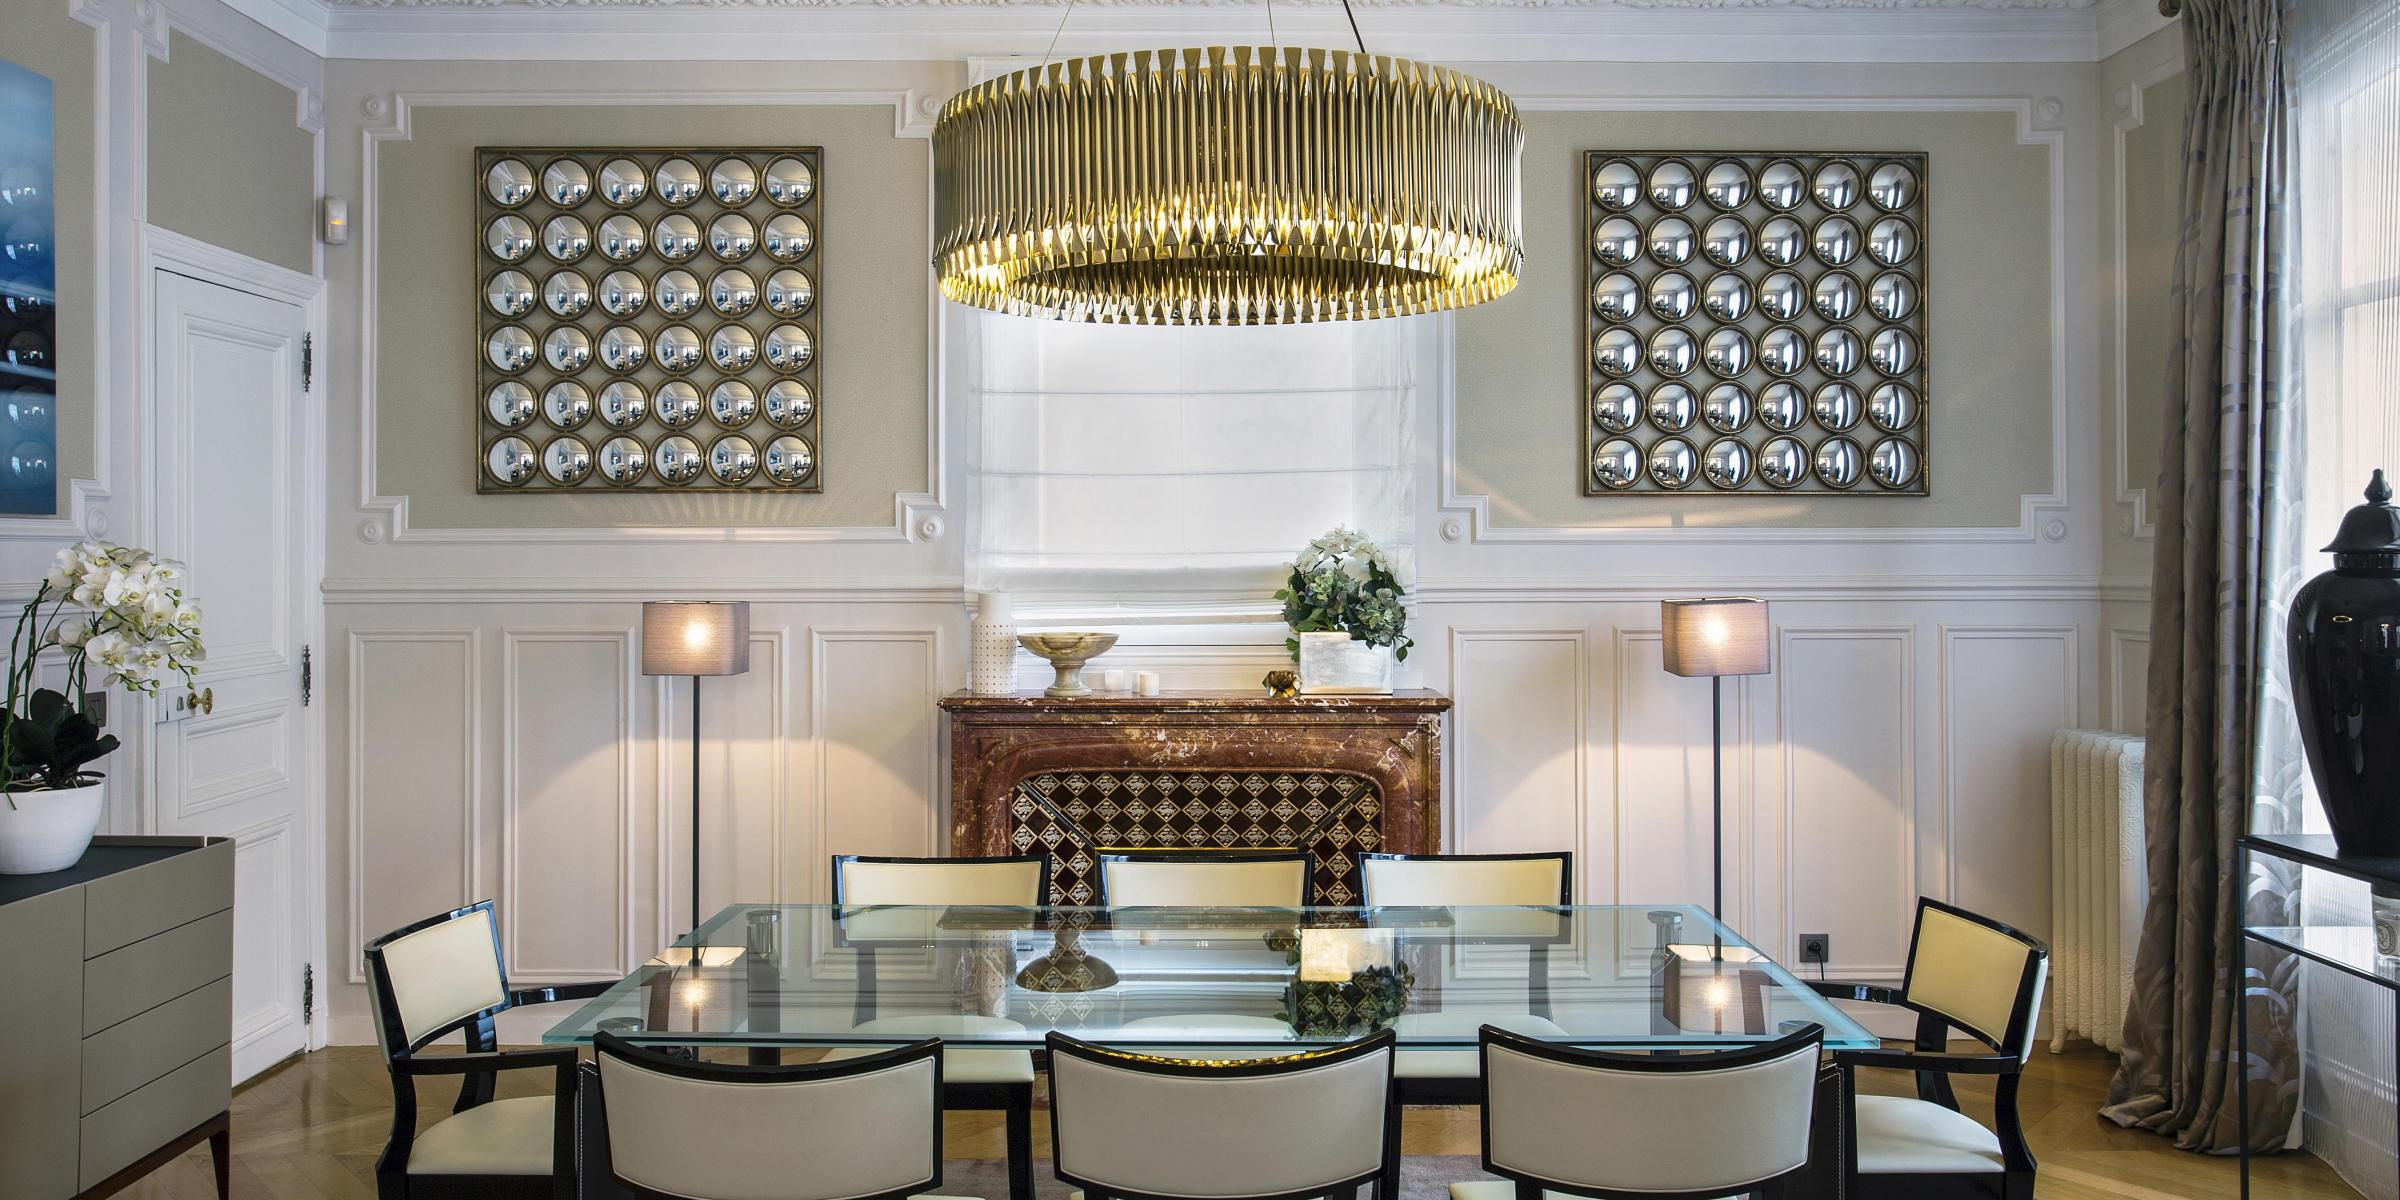 Hôtel particulier salle à manger